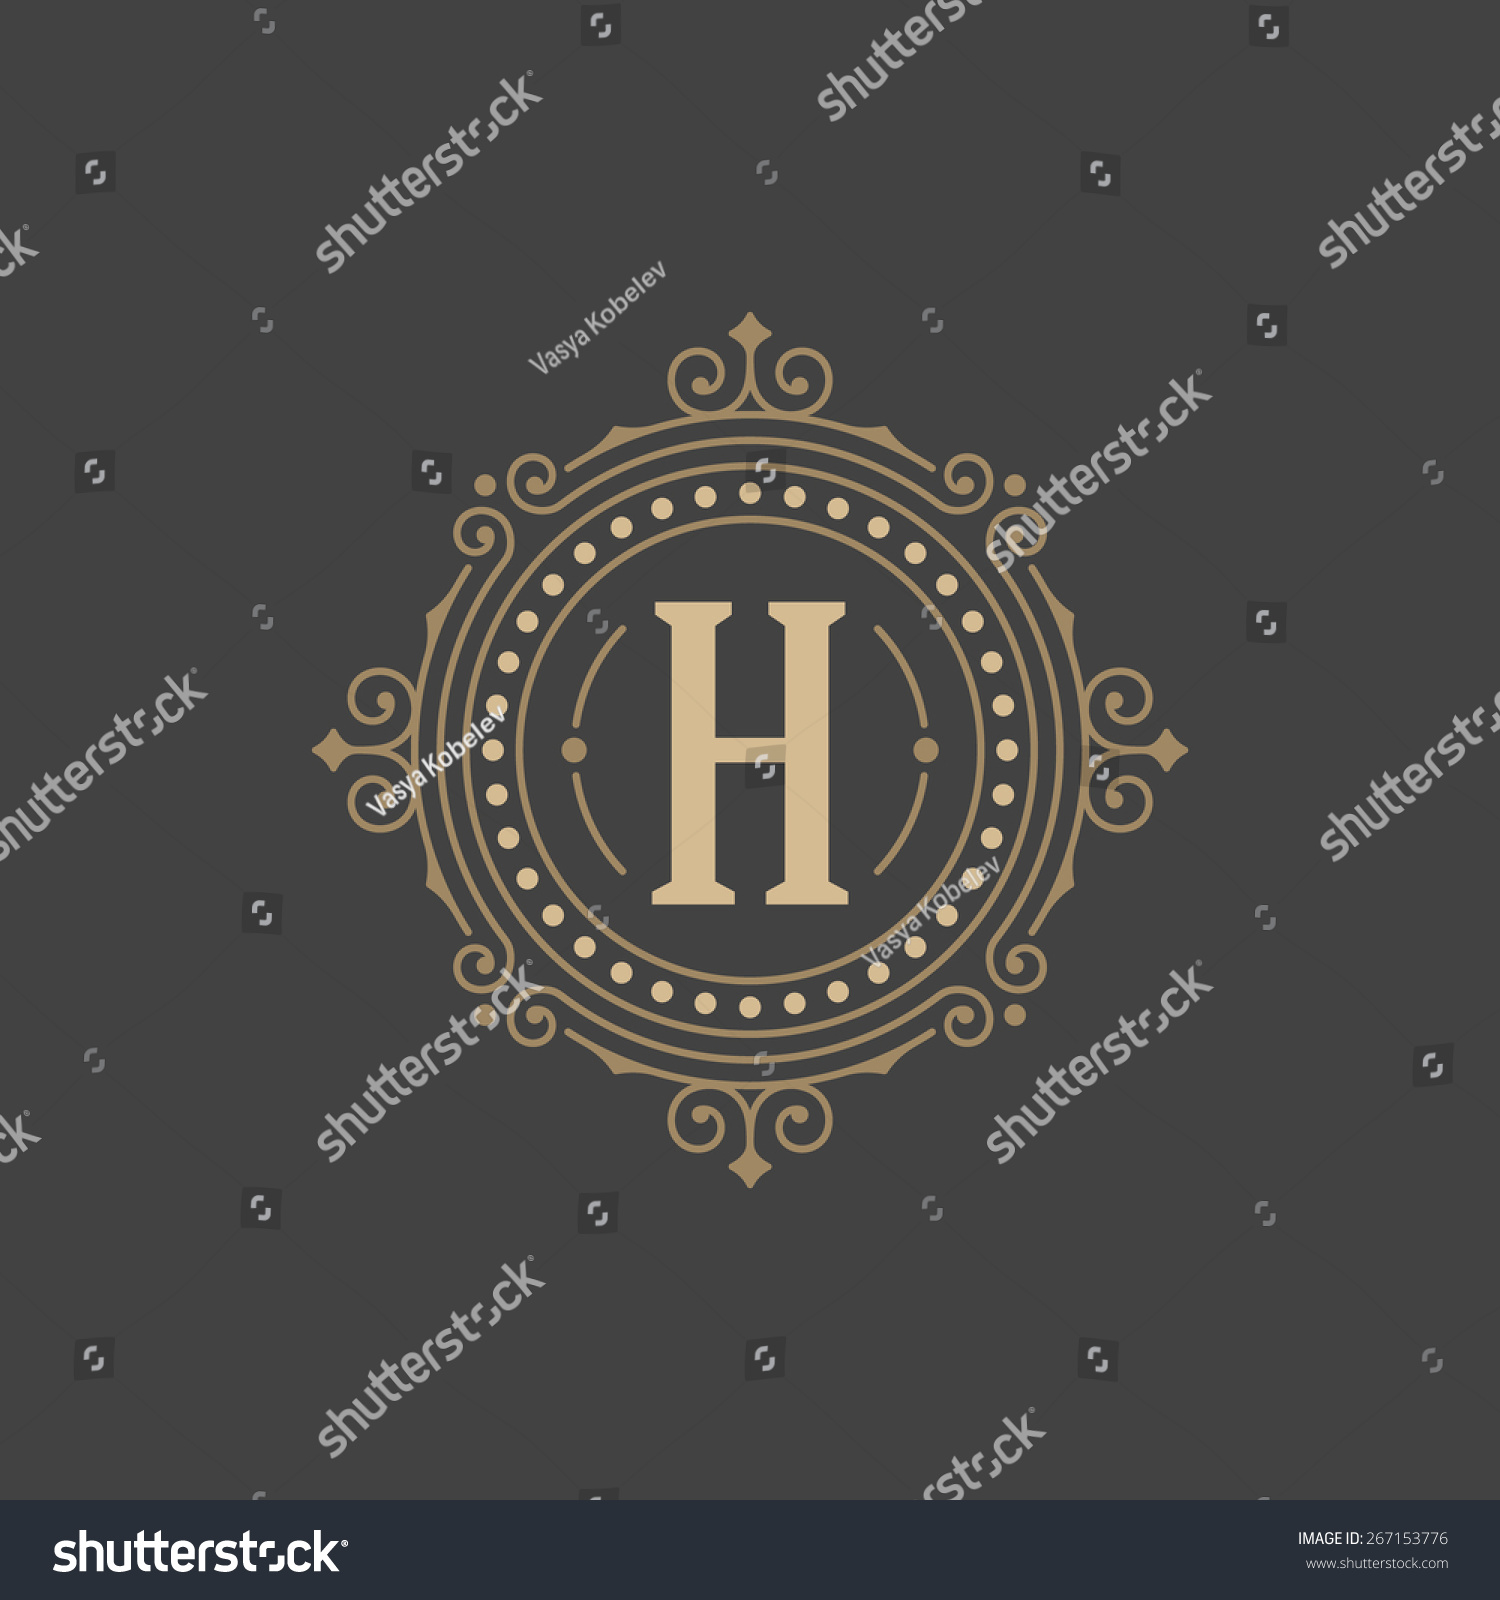 Flourishes Calligraphic Monogram Emblem Template Luxury Stock Vector ...